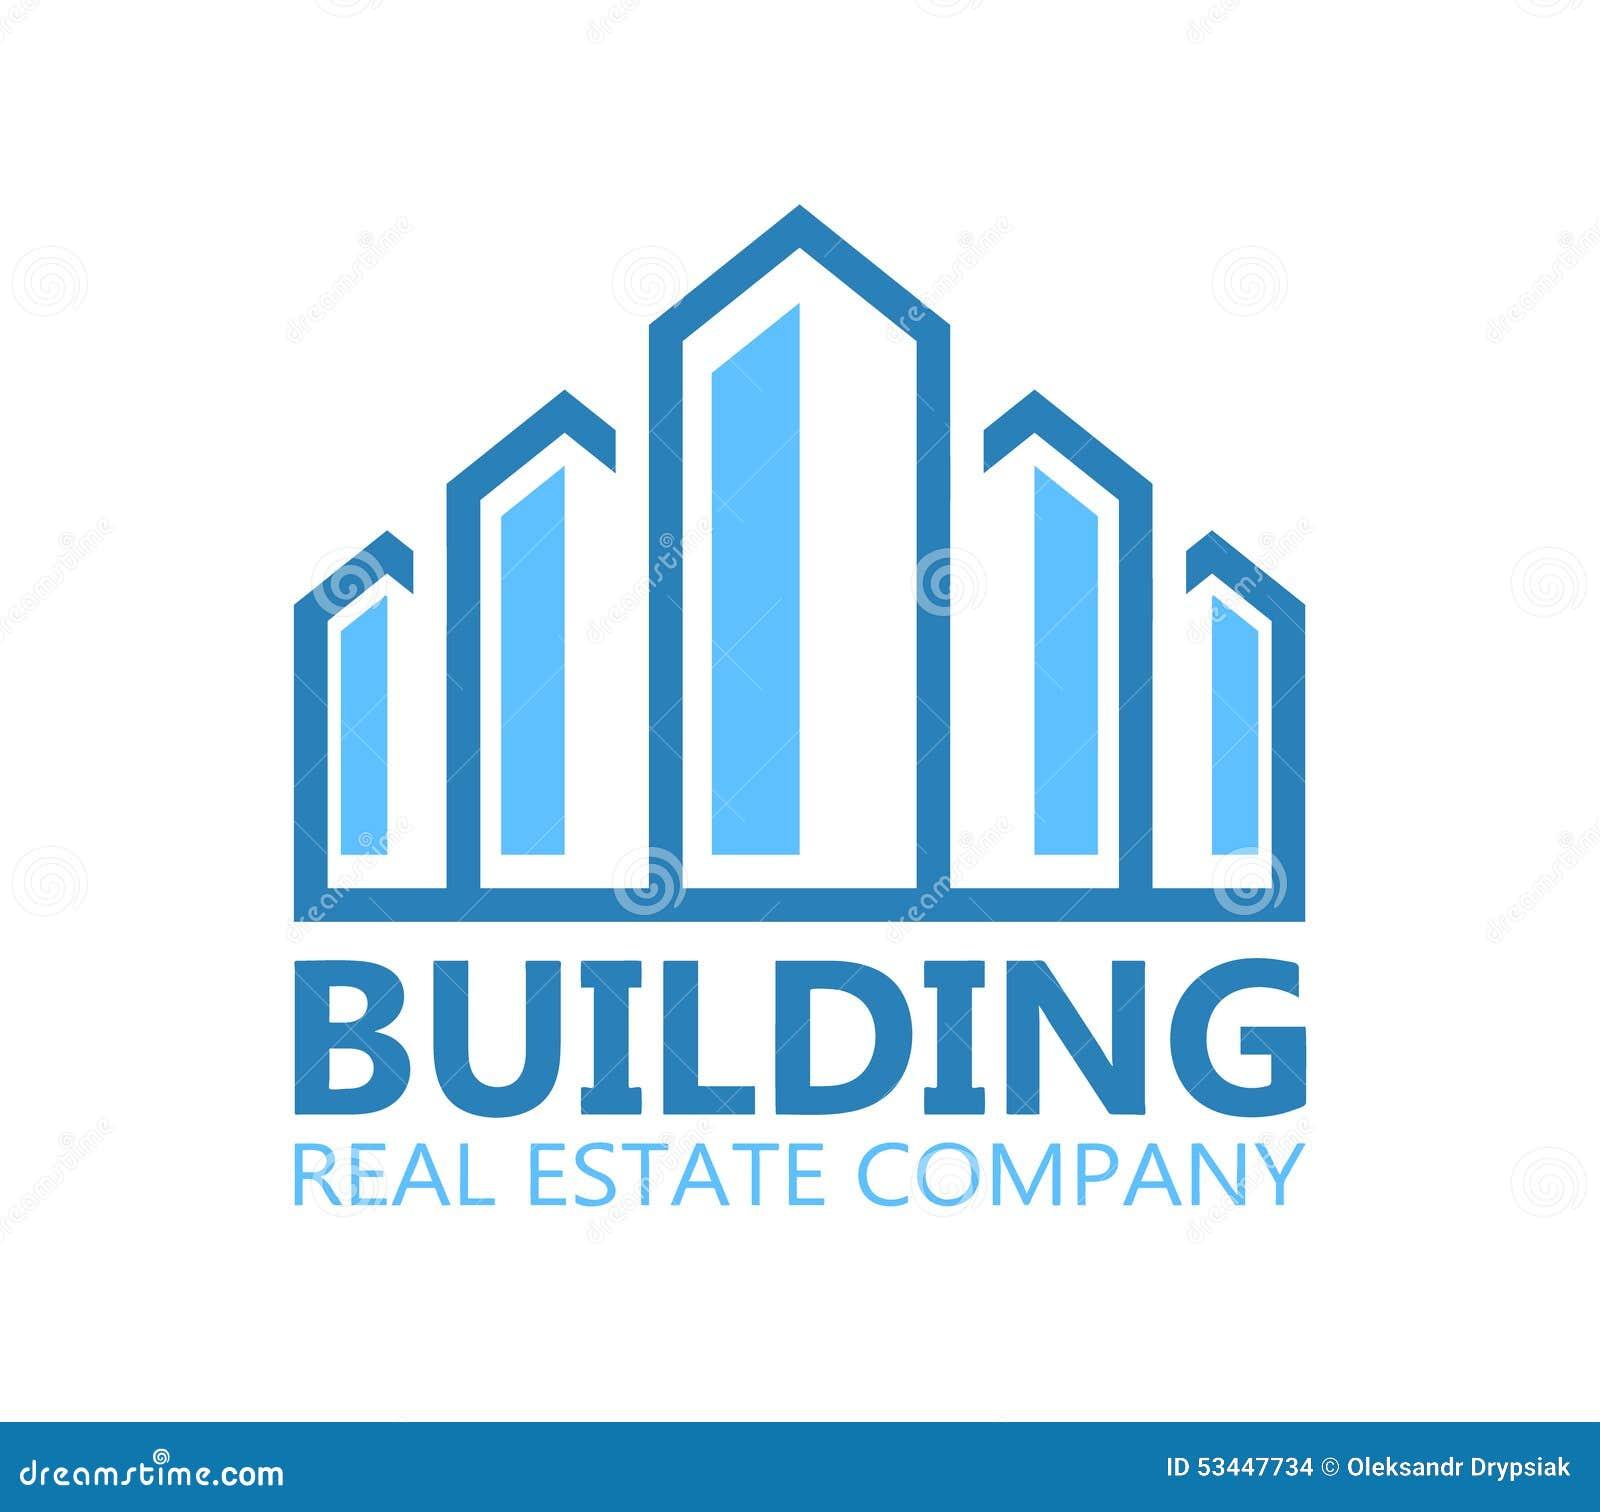 Building Logo Or Symbol Icon Stock Vector - Image: 53447734 : graphic design agency logo : Photo Logo Design